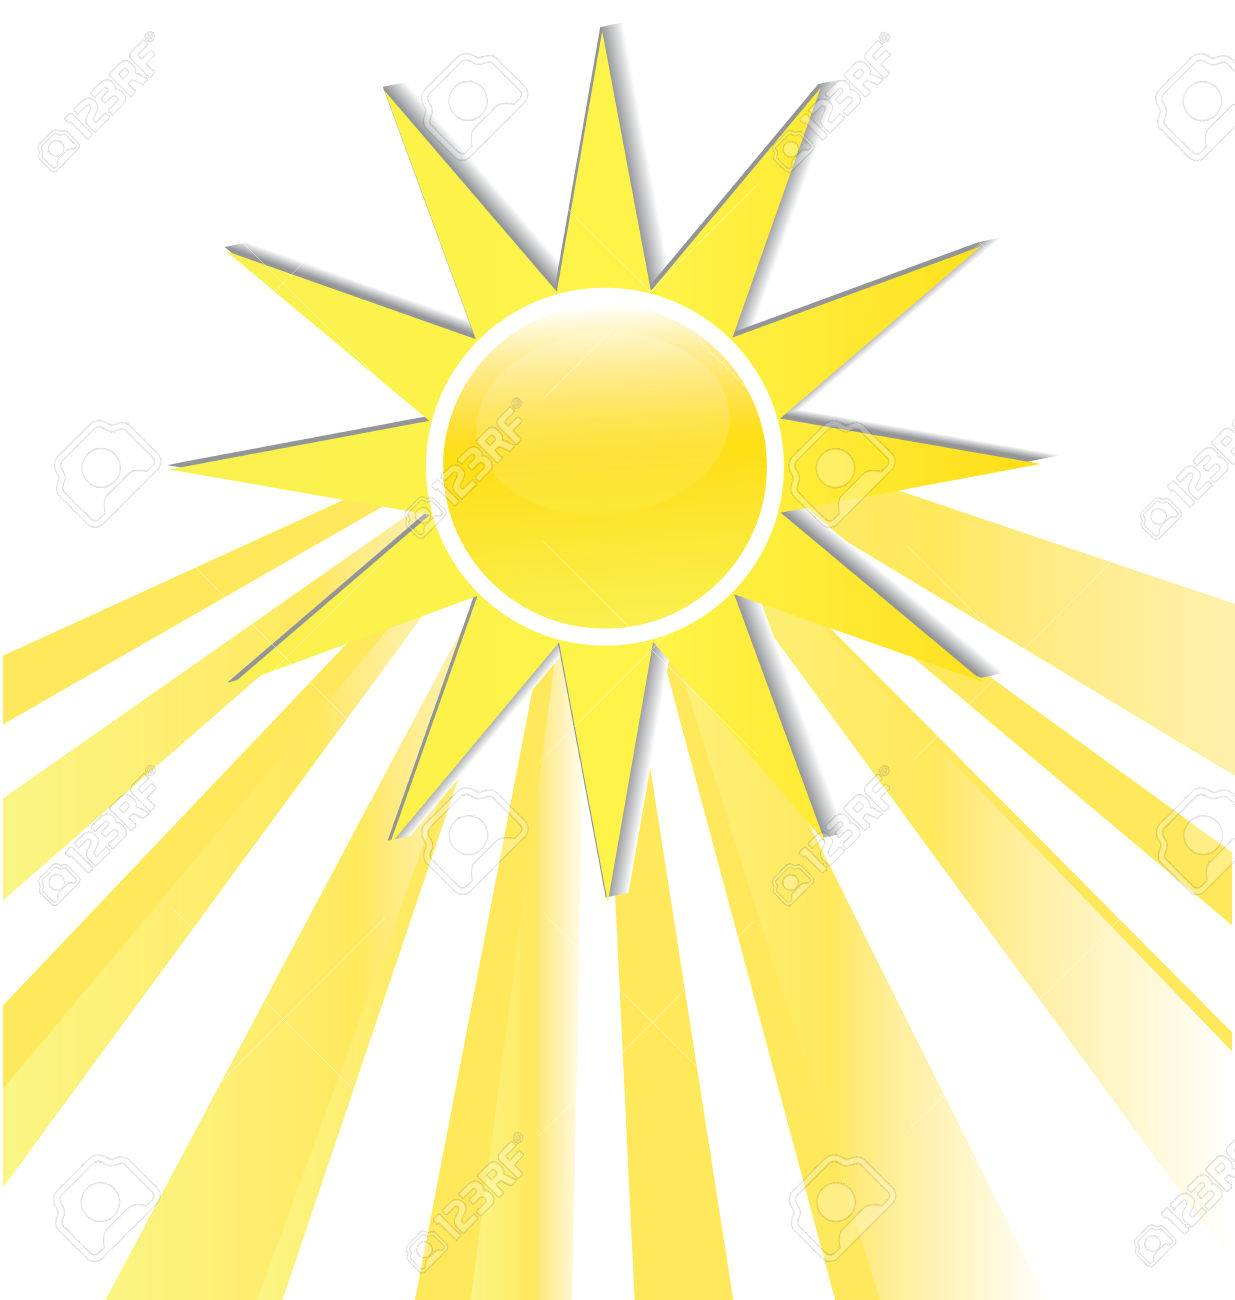 hight resolution of sun rays icon logo stock vector 74478974